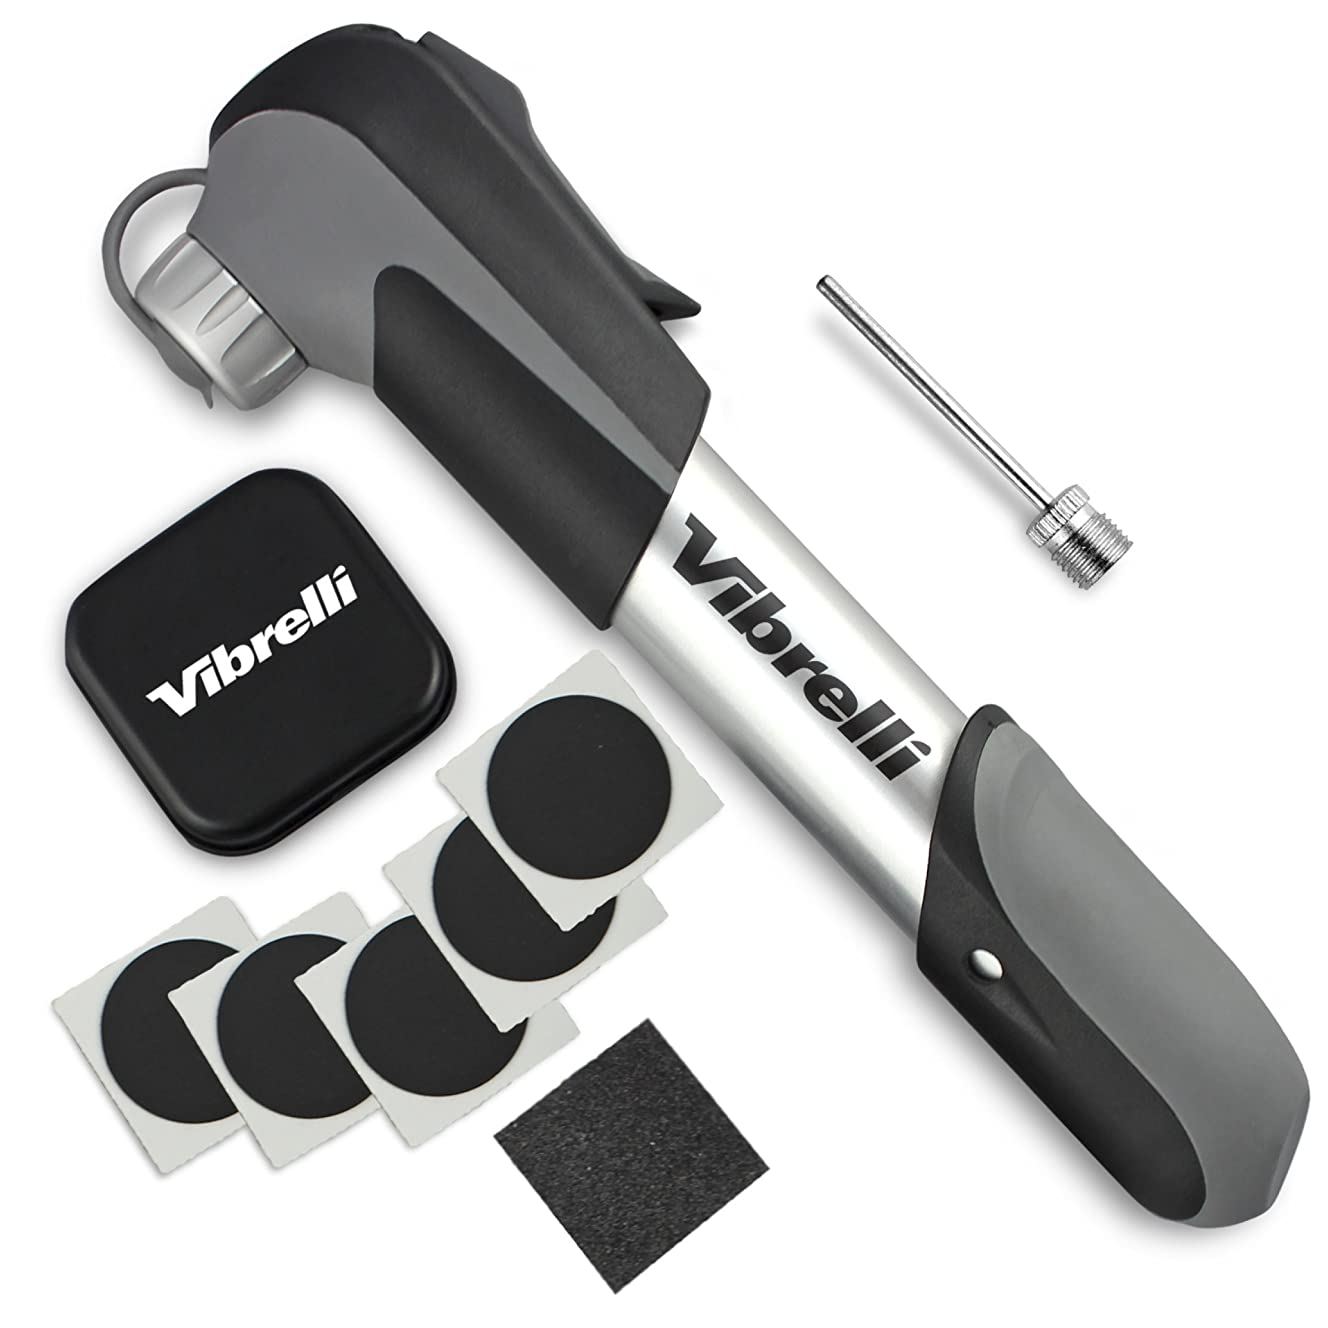 Vibrelli Mini Bike Pump & Glueless Puncture Repair Kit - Fits Presta & Schrader - 120 PSI - No Valve Changing Needed